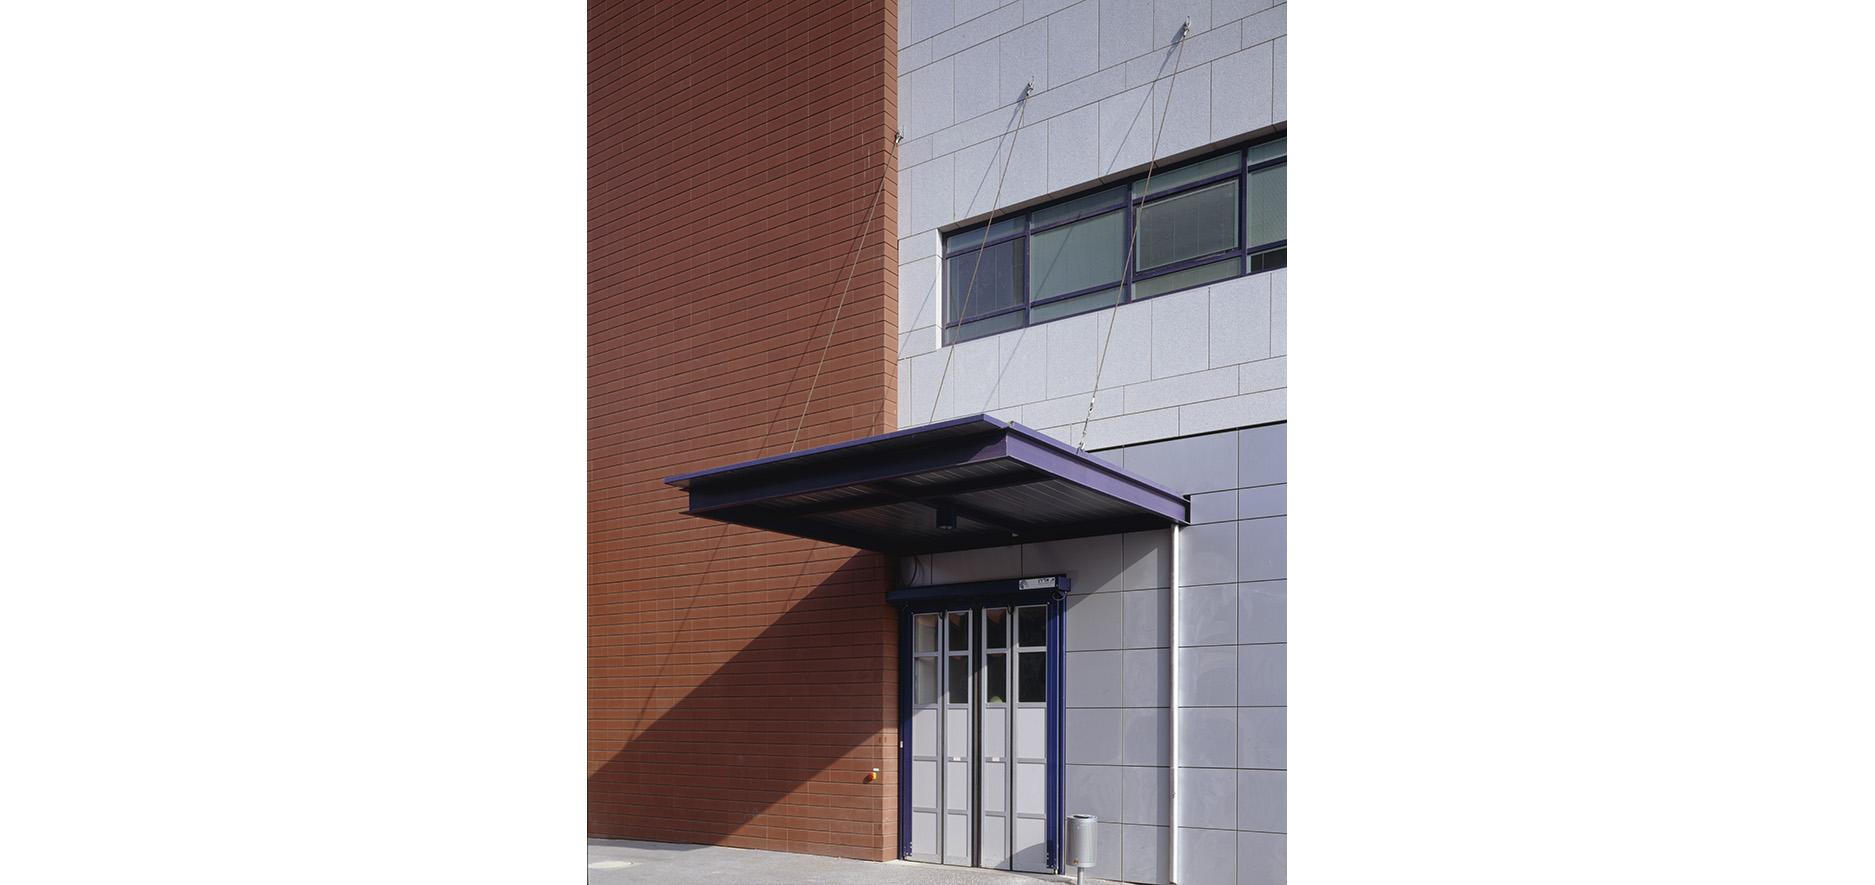 Binyan_Applied_materials_by_KolkerEpstein_Architects004